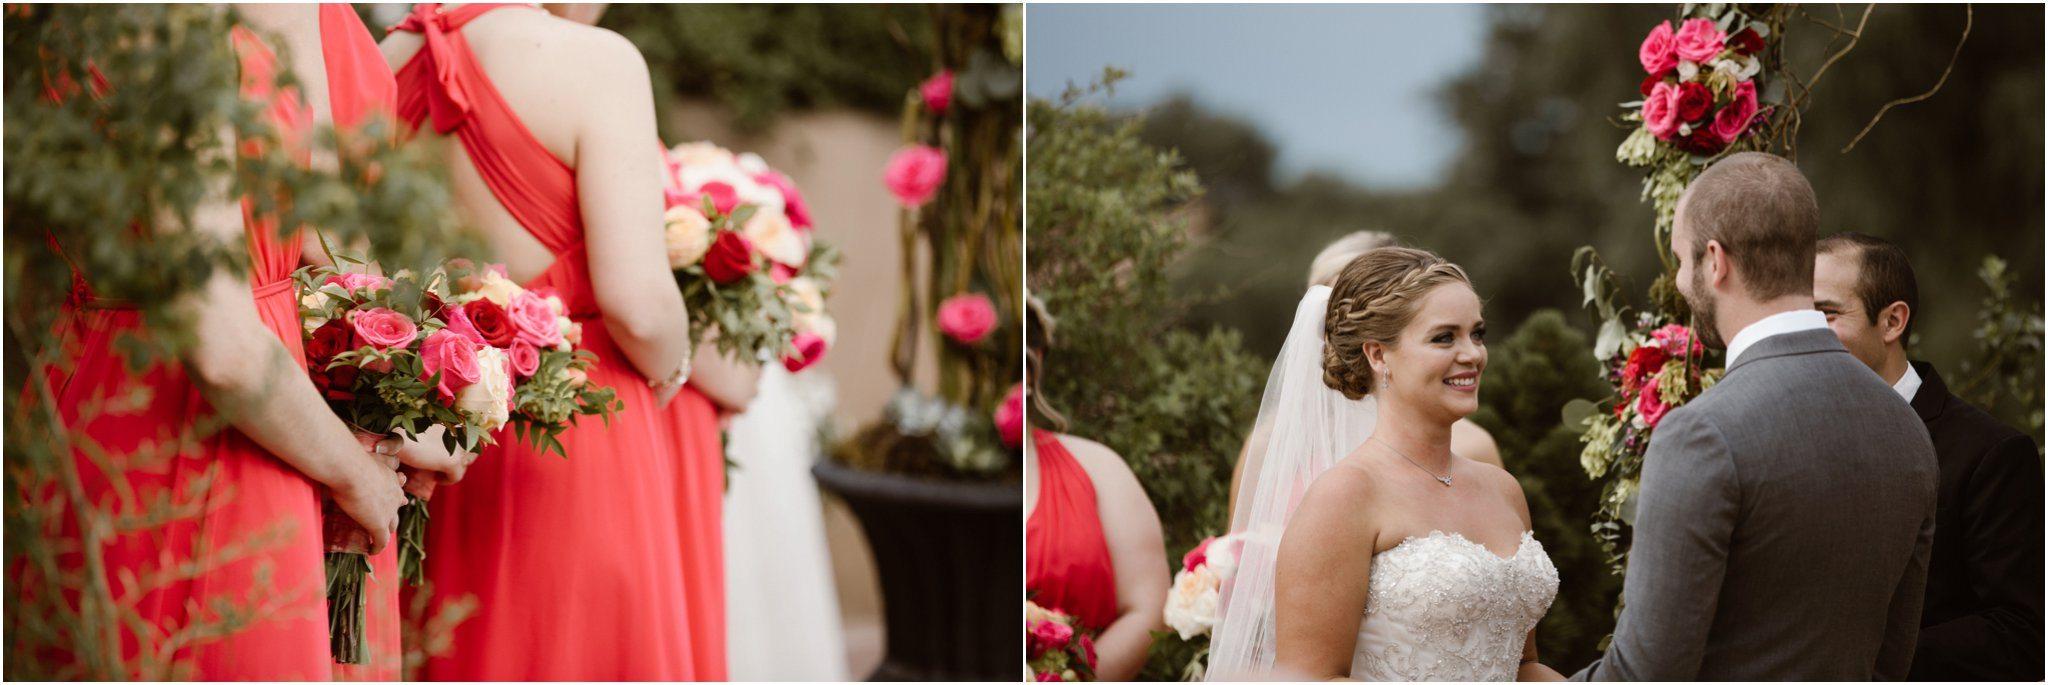 0040albuquerque-wedding-photographer_-santa-fe-wedding-photographer_-southwest-wedding-photography_-blue-rose-studio